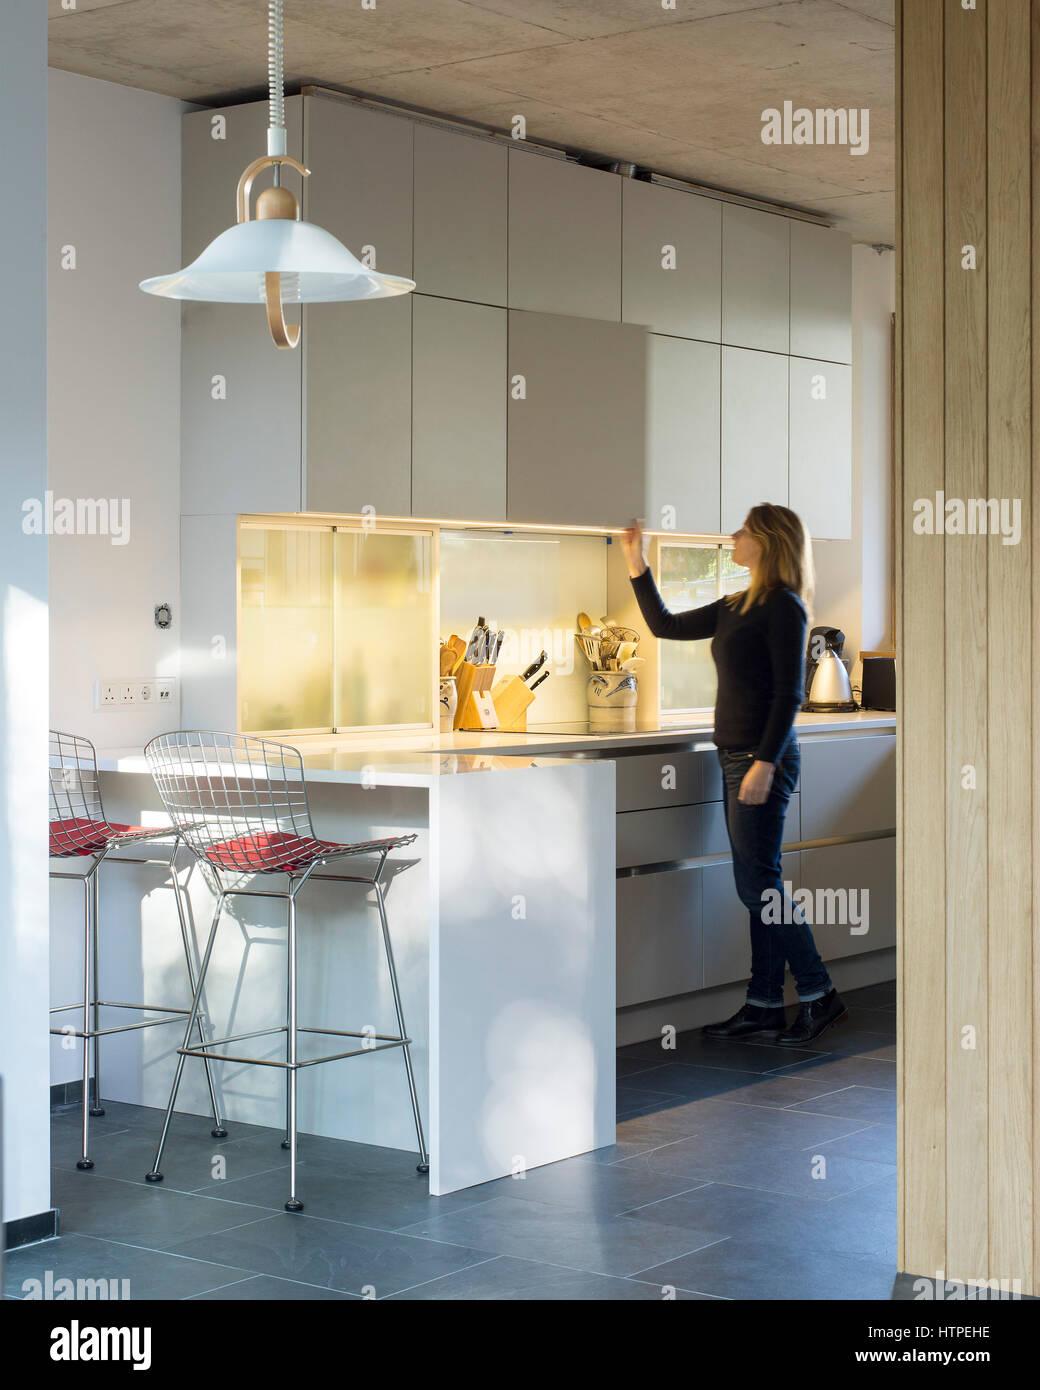 Interior View Of Kitchen. Private House, London, United Kingdom. Architect:  Panter